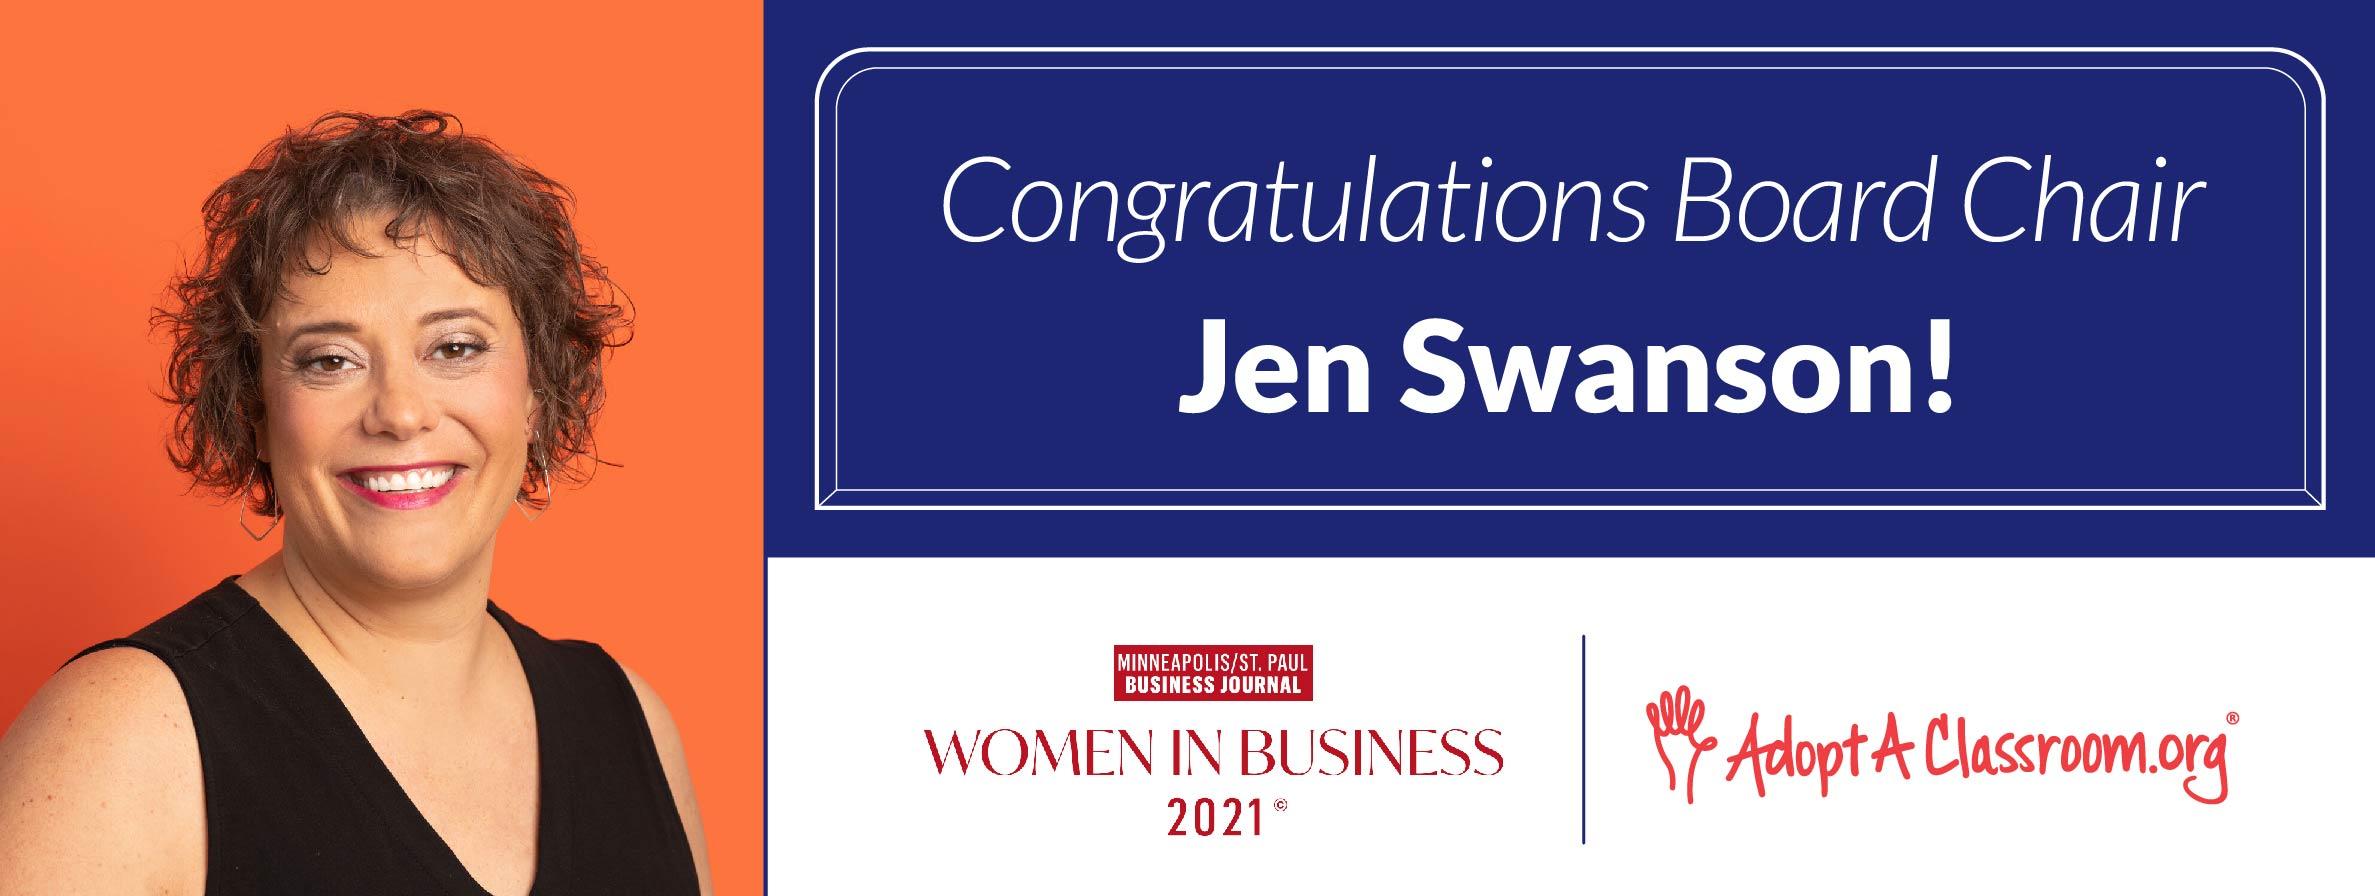 Congratulations Jen Swanson